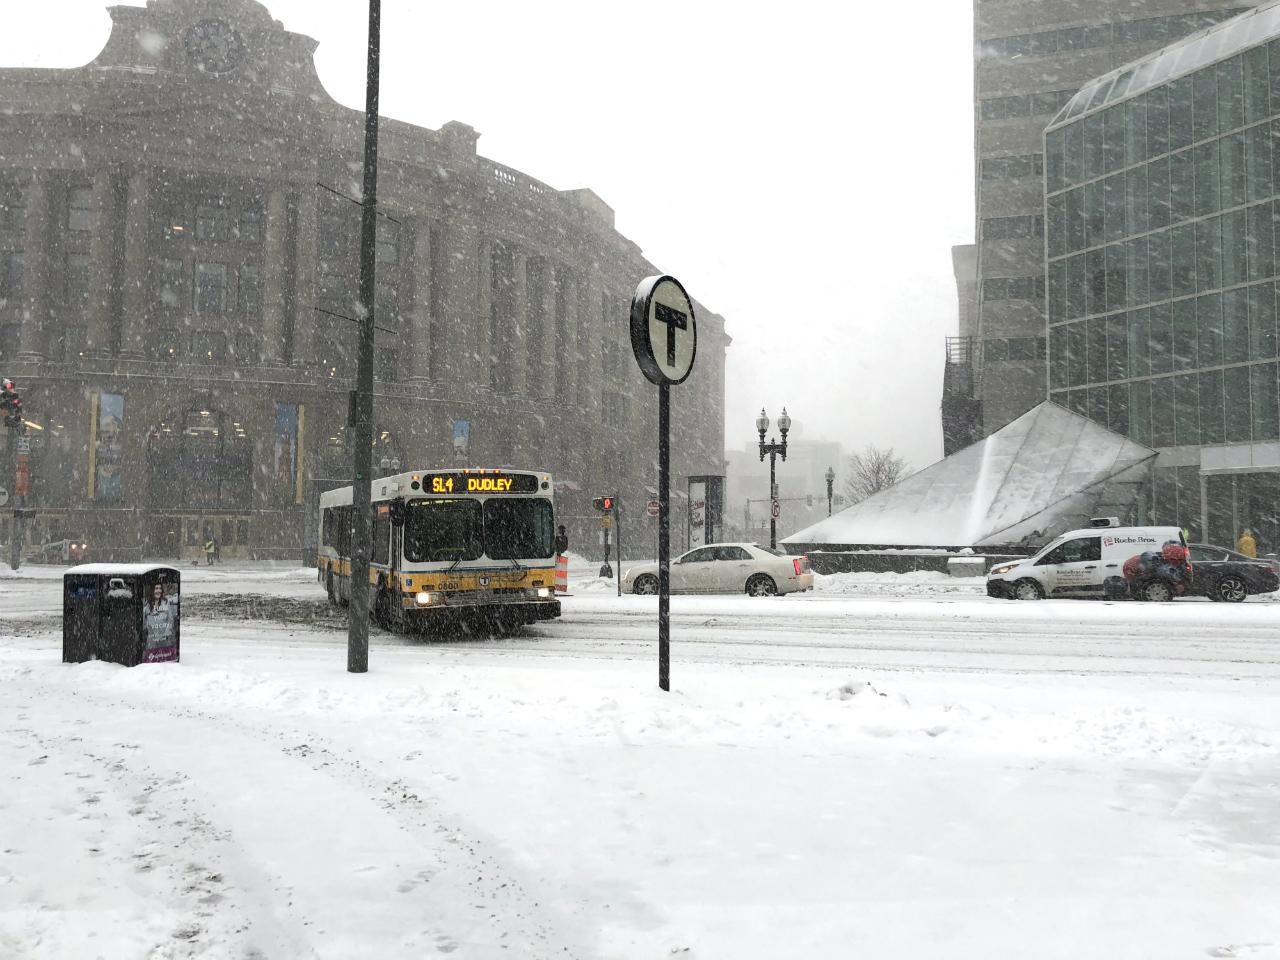 south-station-bus.jpg